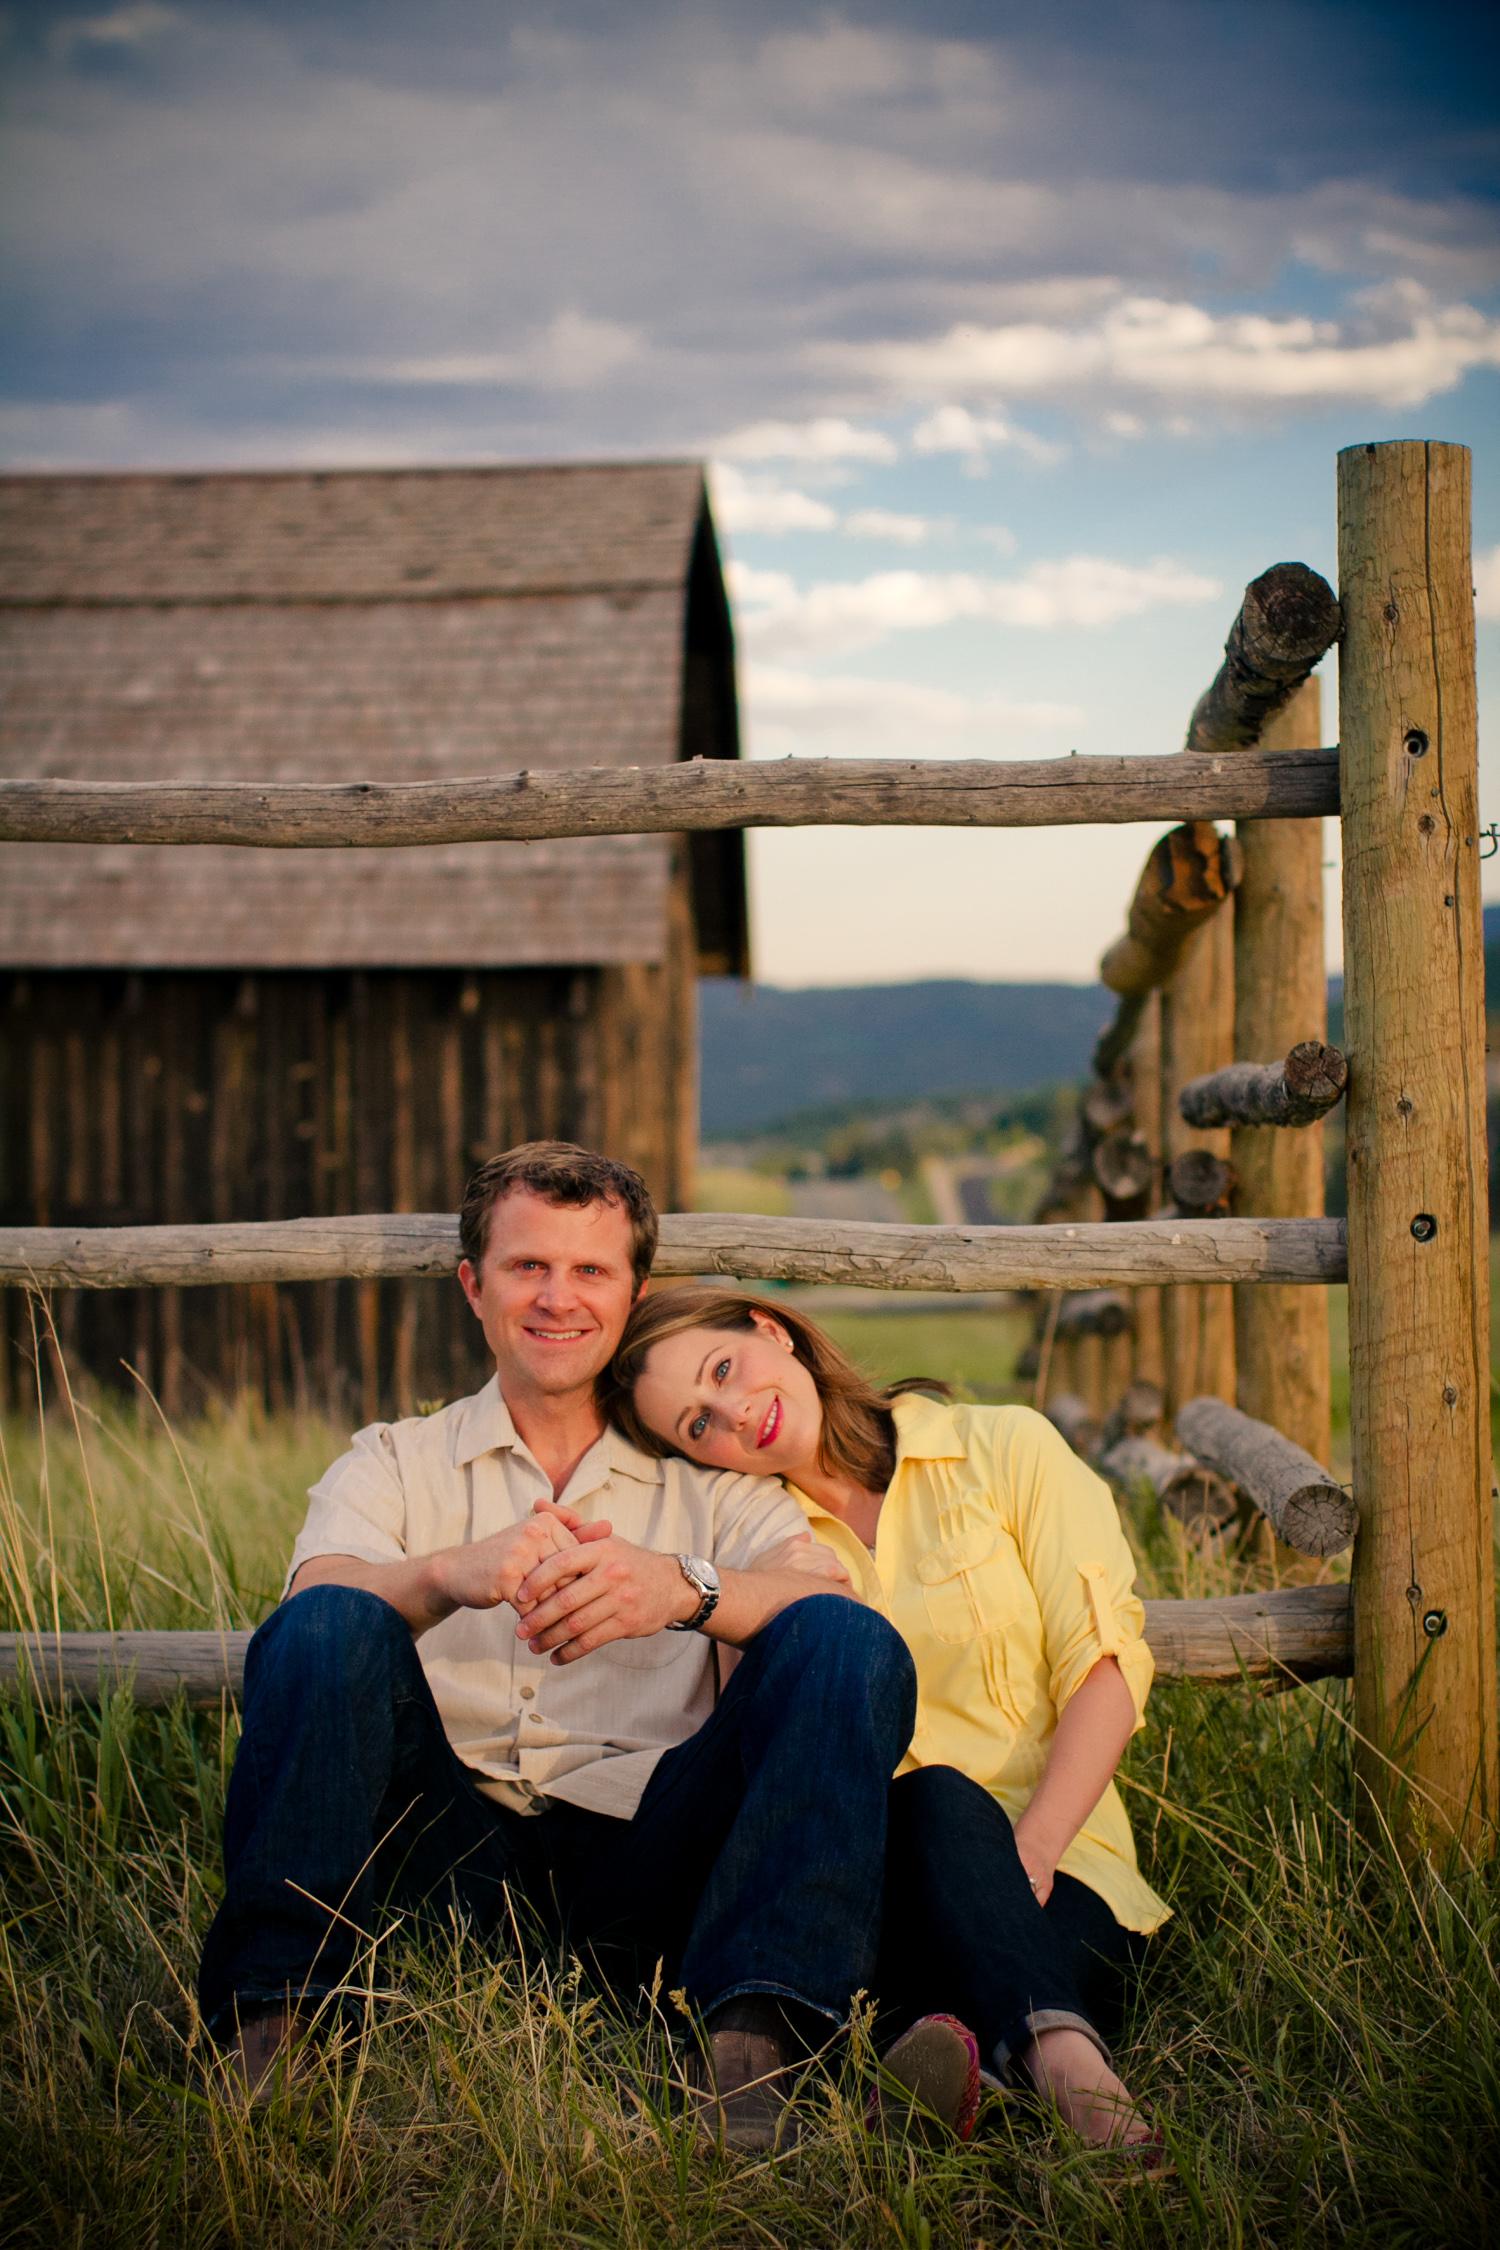 Evergreen_Engagement_Photos_026.JPG